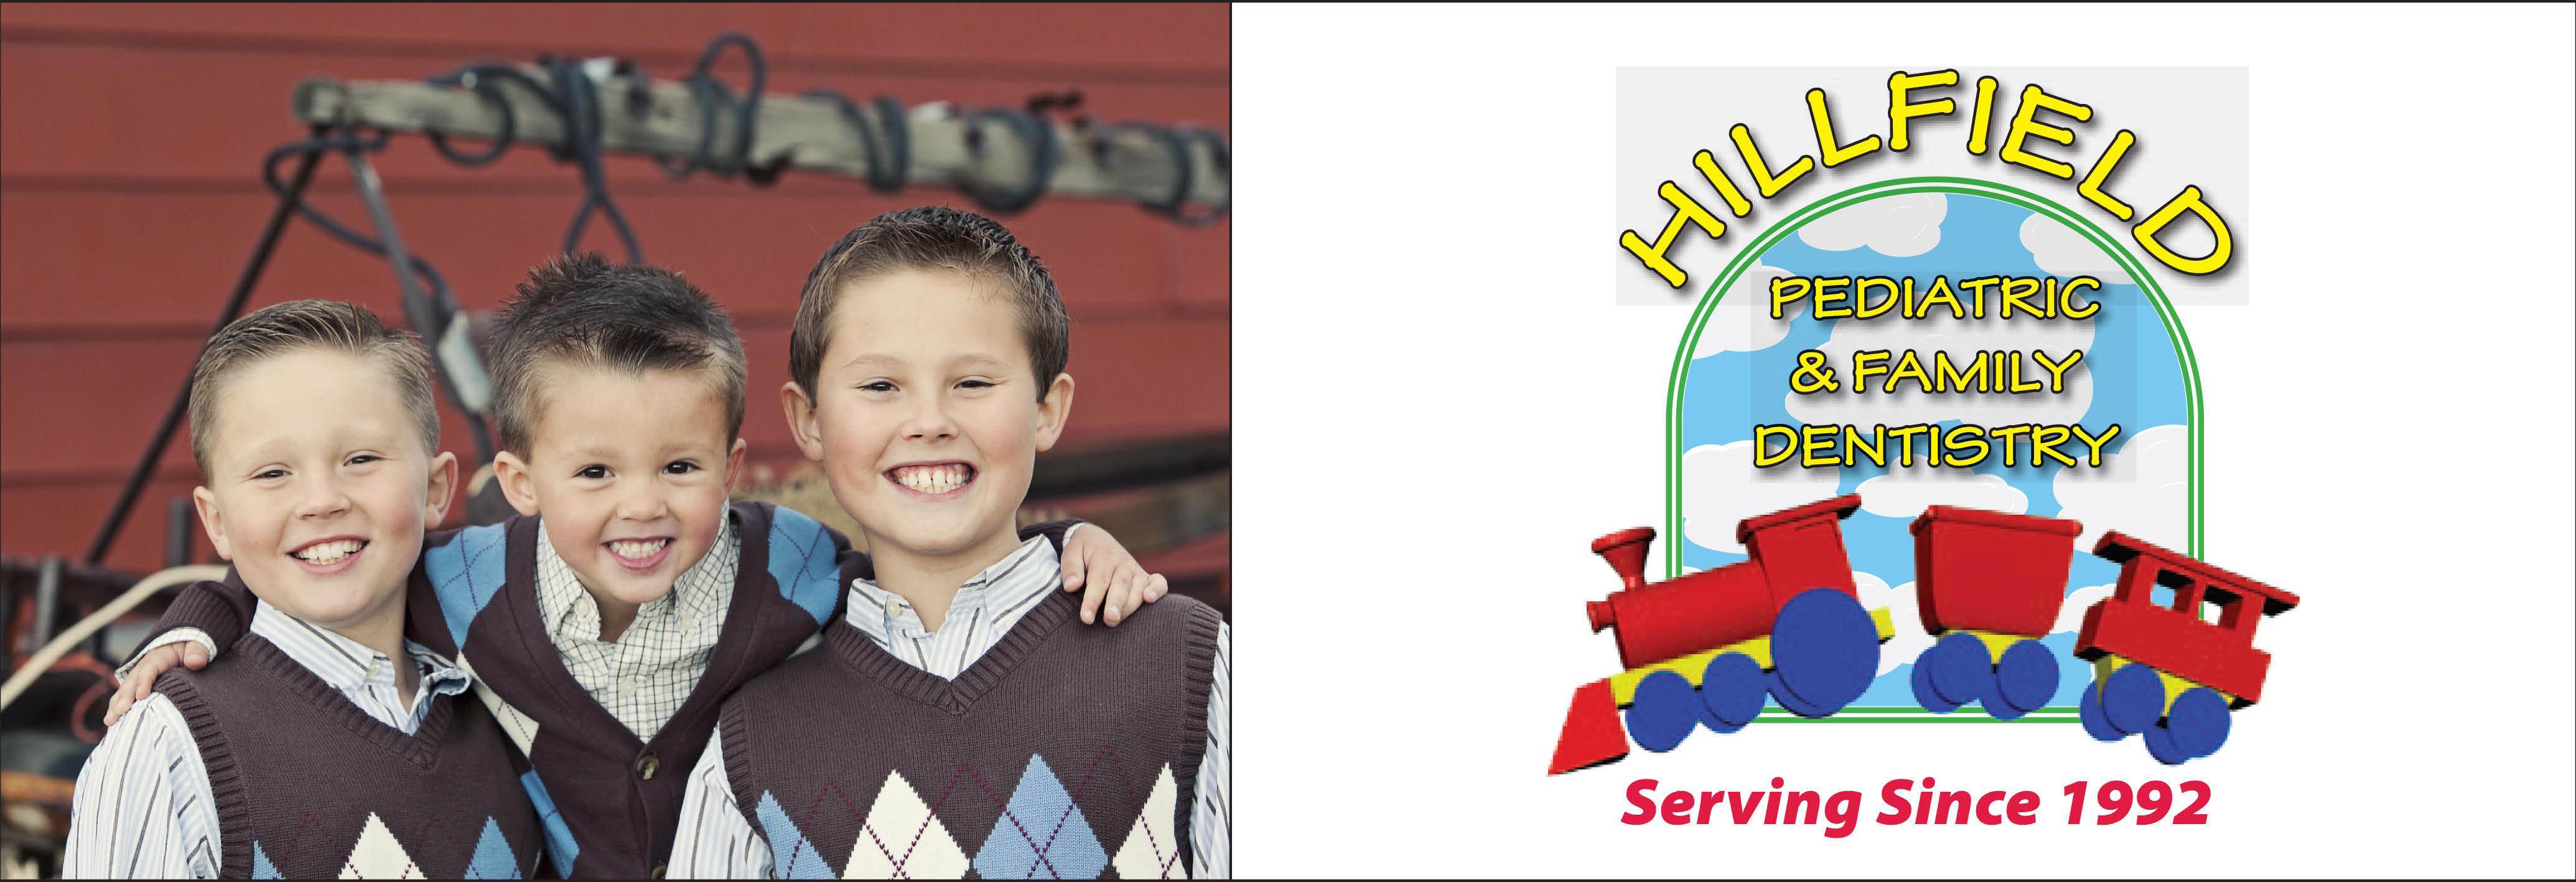 Hillfield Pediatric & Family Dentistry banner in Layton, Utah